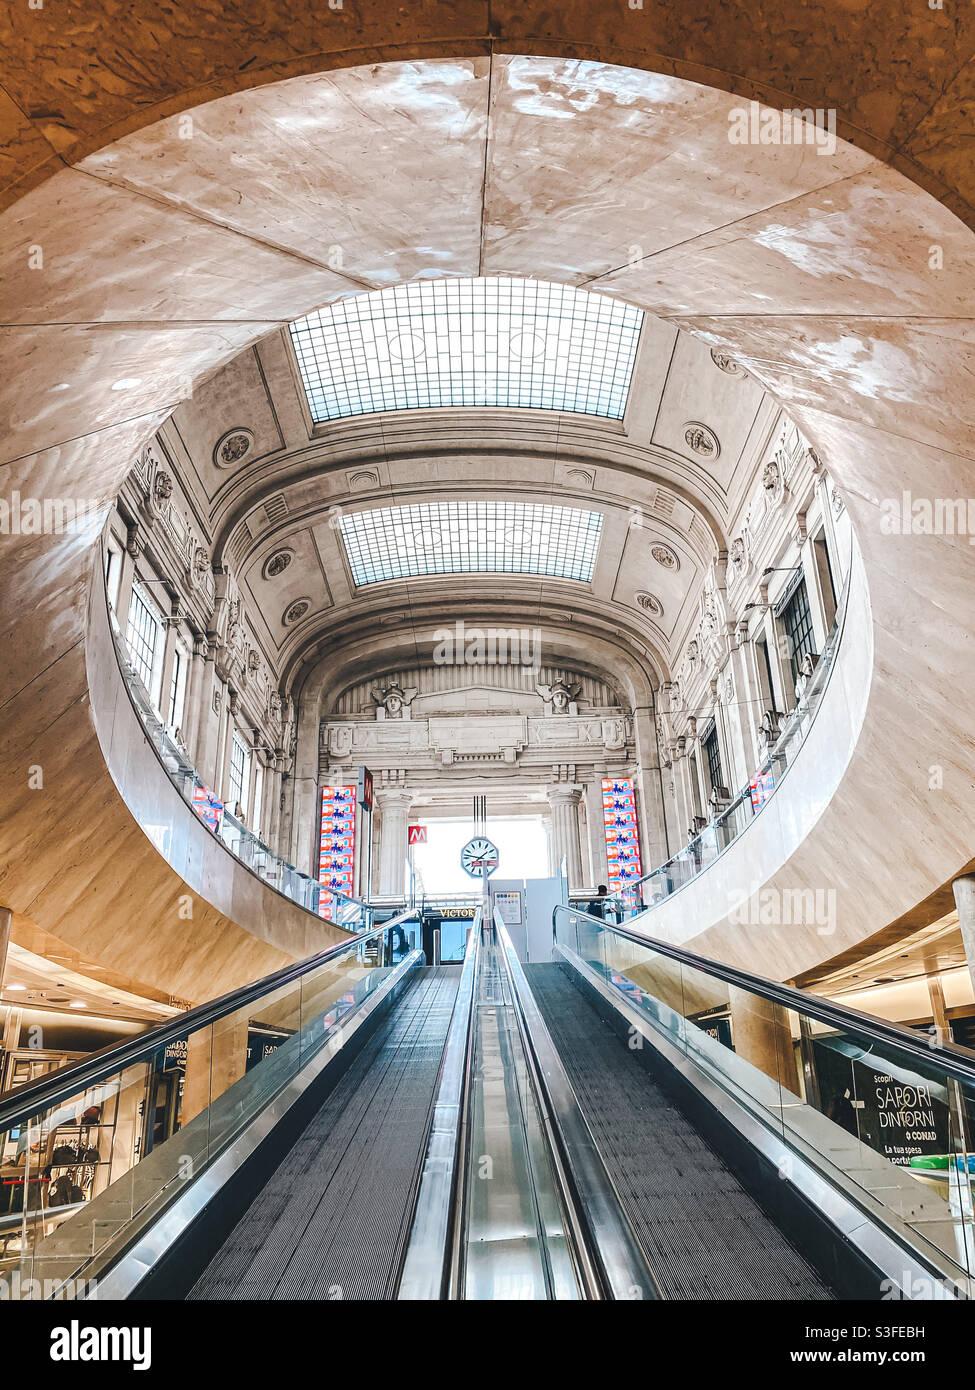 Ankunft am Bahnhof in Mailand Stockfoto